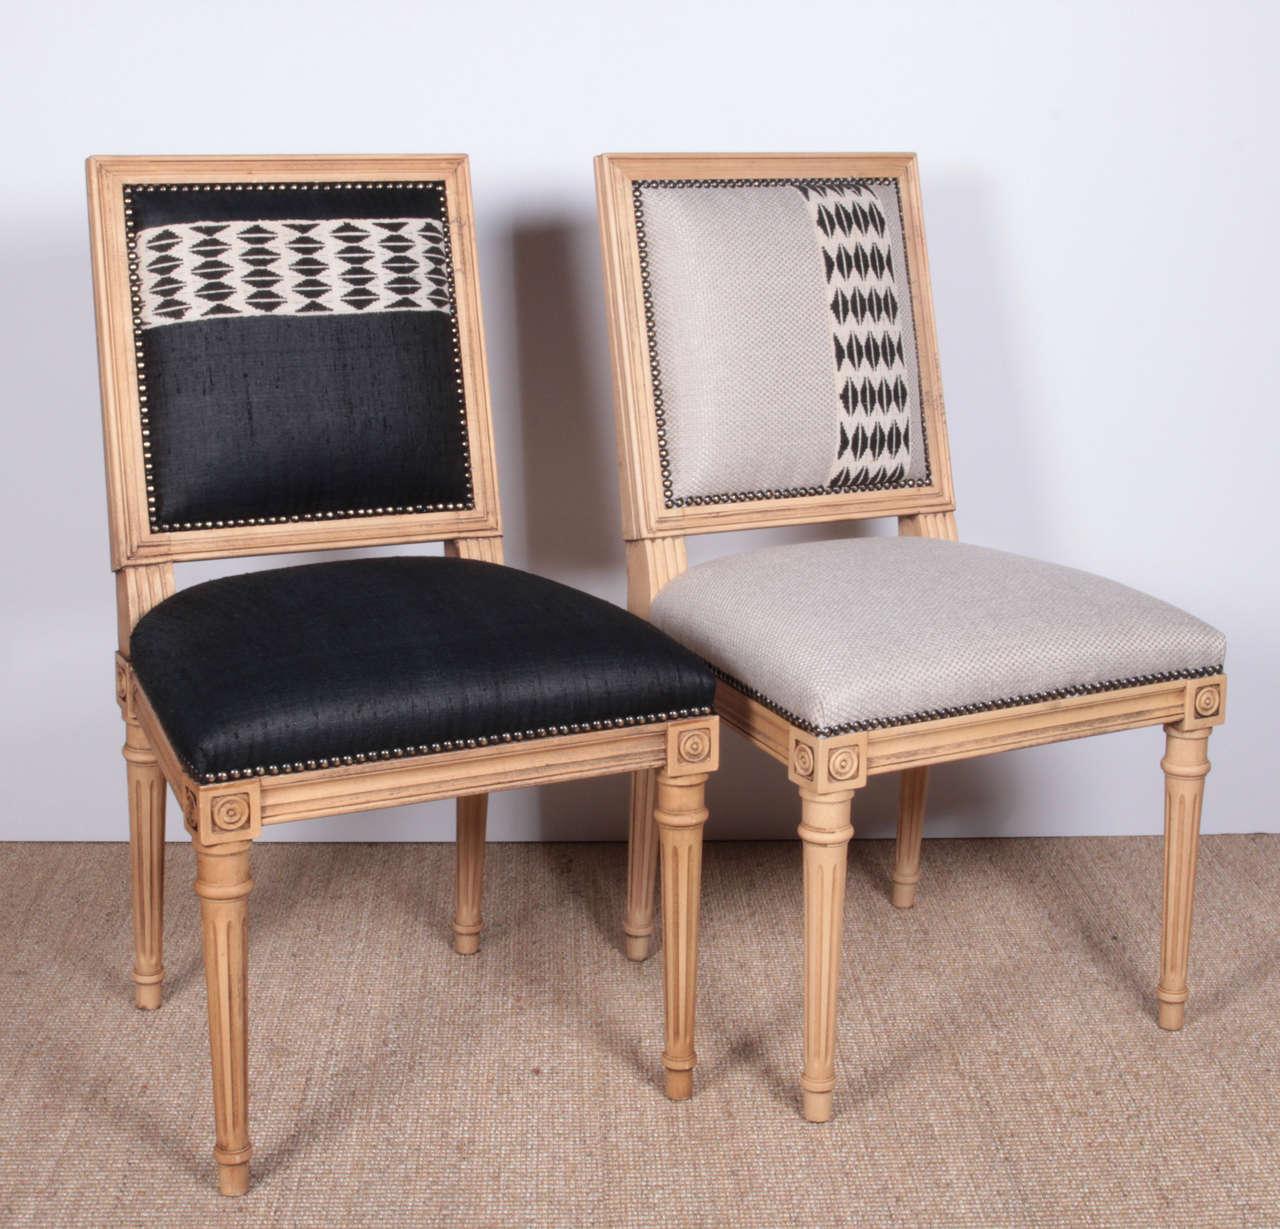 antony todd sofa maharaja diwan set collection louis xvi dining chairs at 1stdibs